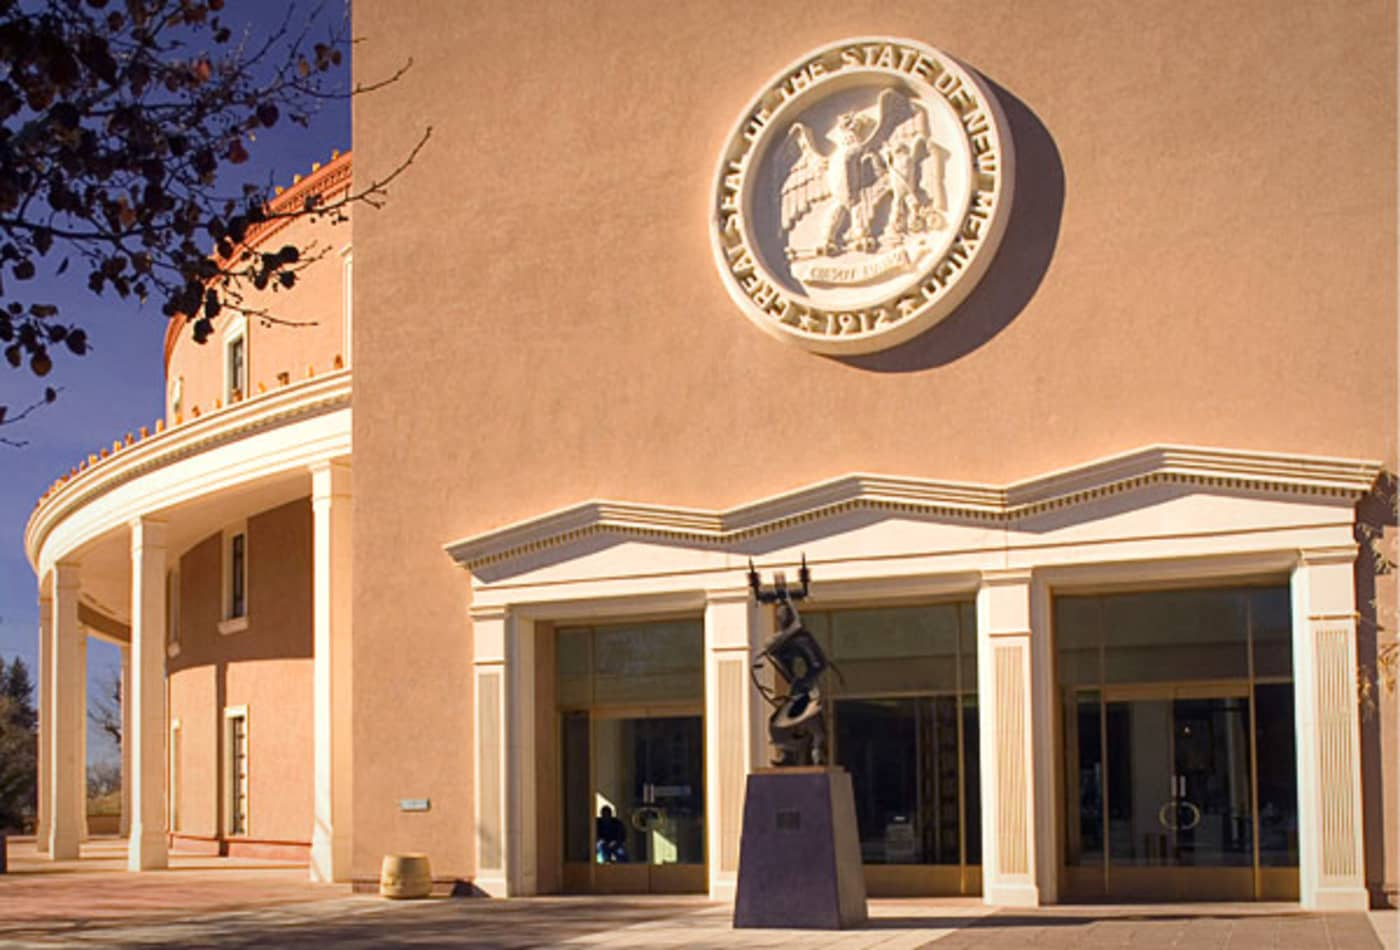 New-Mexico-American-Tax-Havens-CNBC.jpg